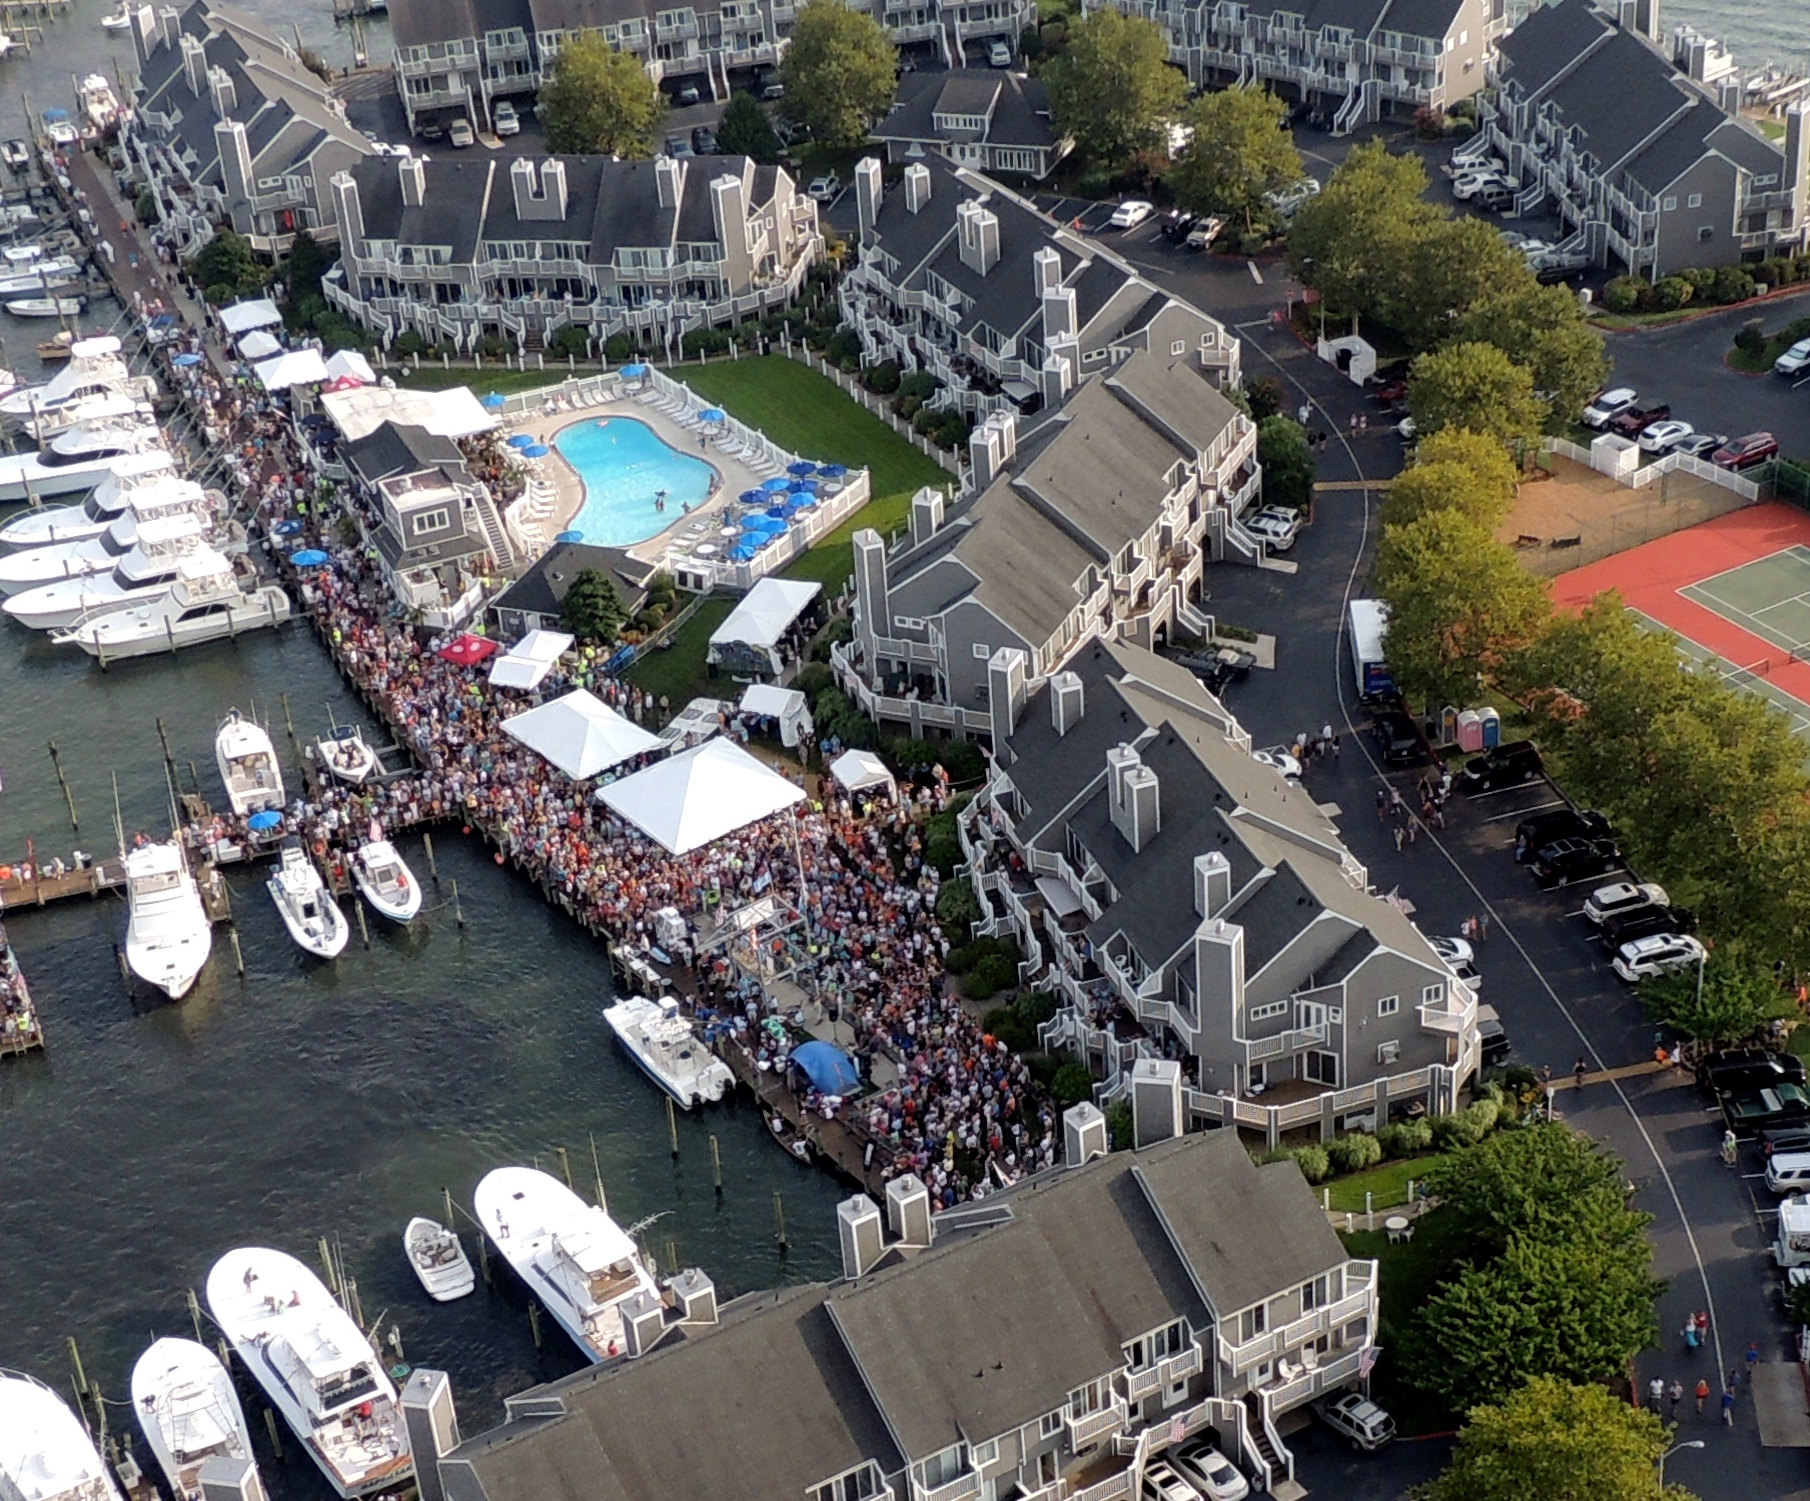 Council, WMO Reach Marlin Fest Event Agreement